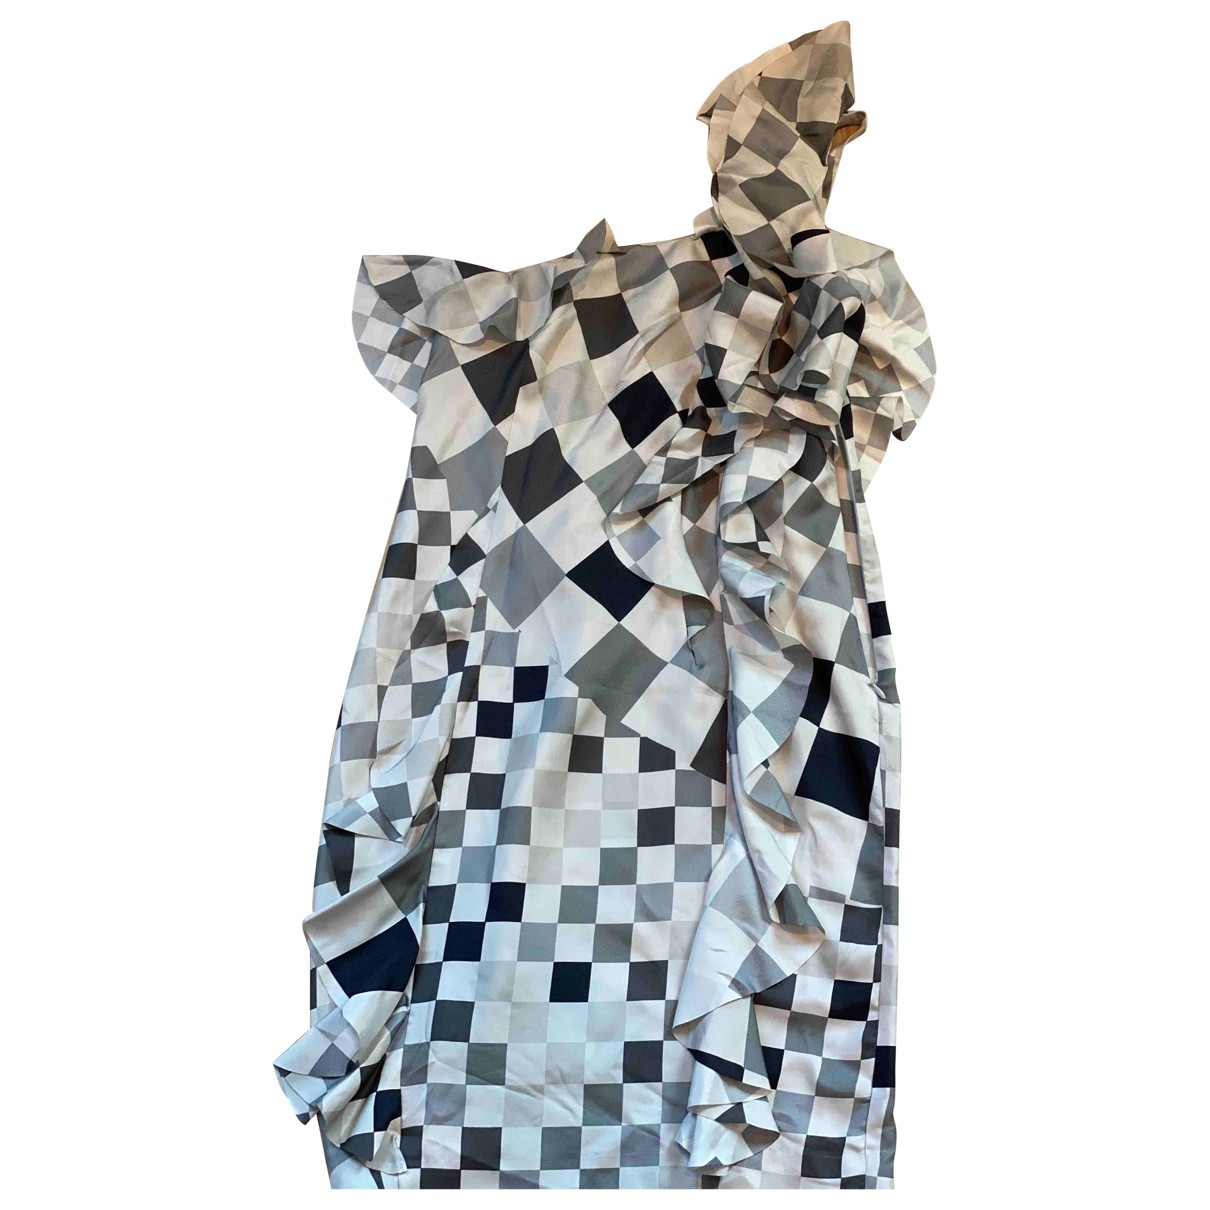 Paul Smith \N Multicolour Silk dress for Women 36 EU